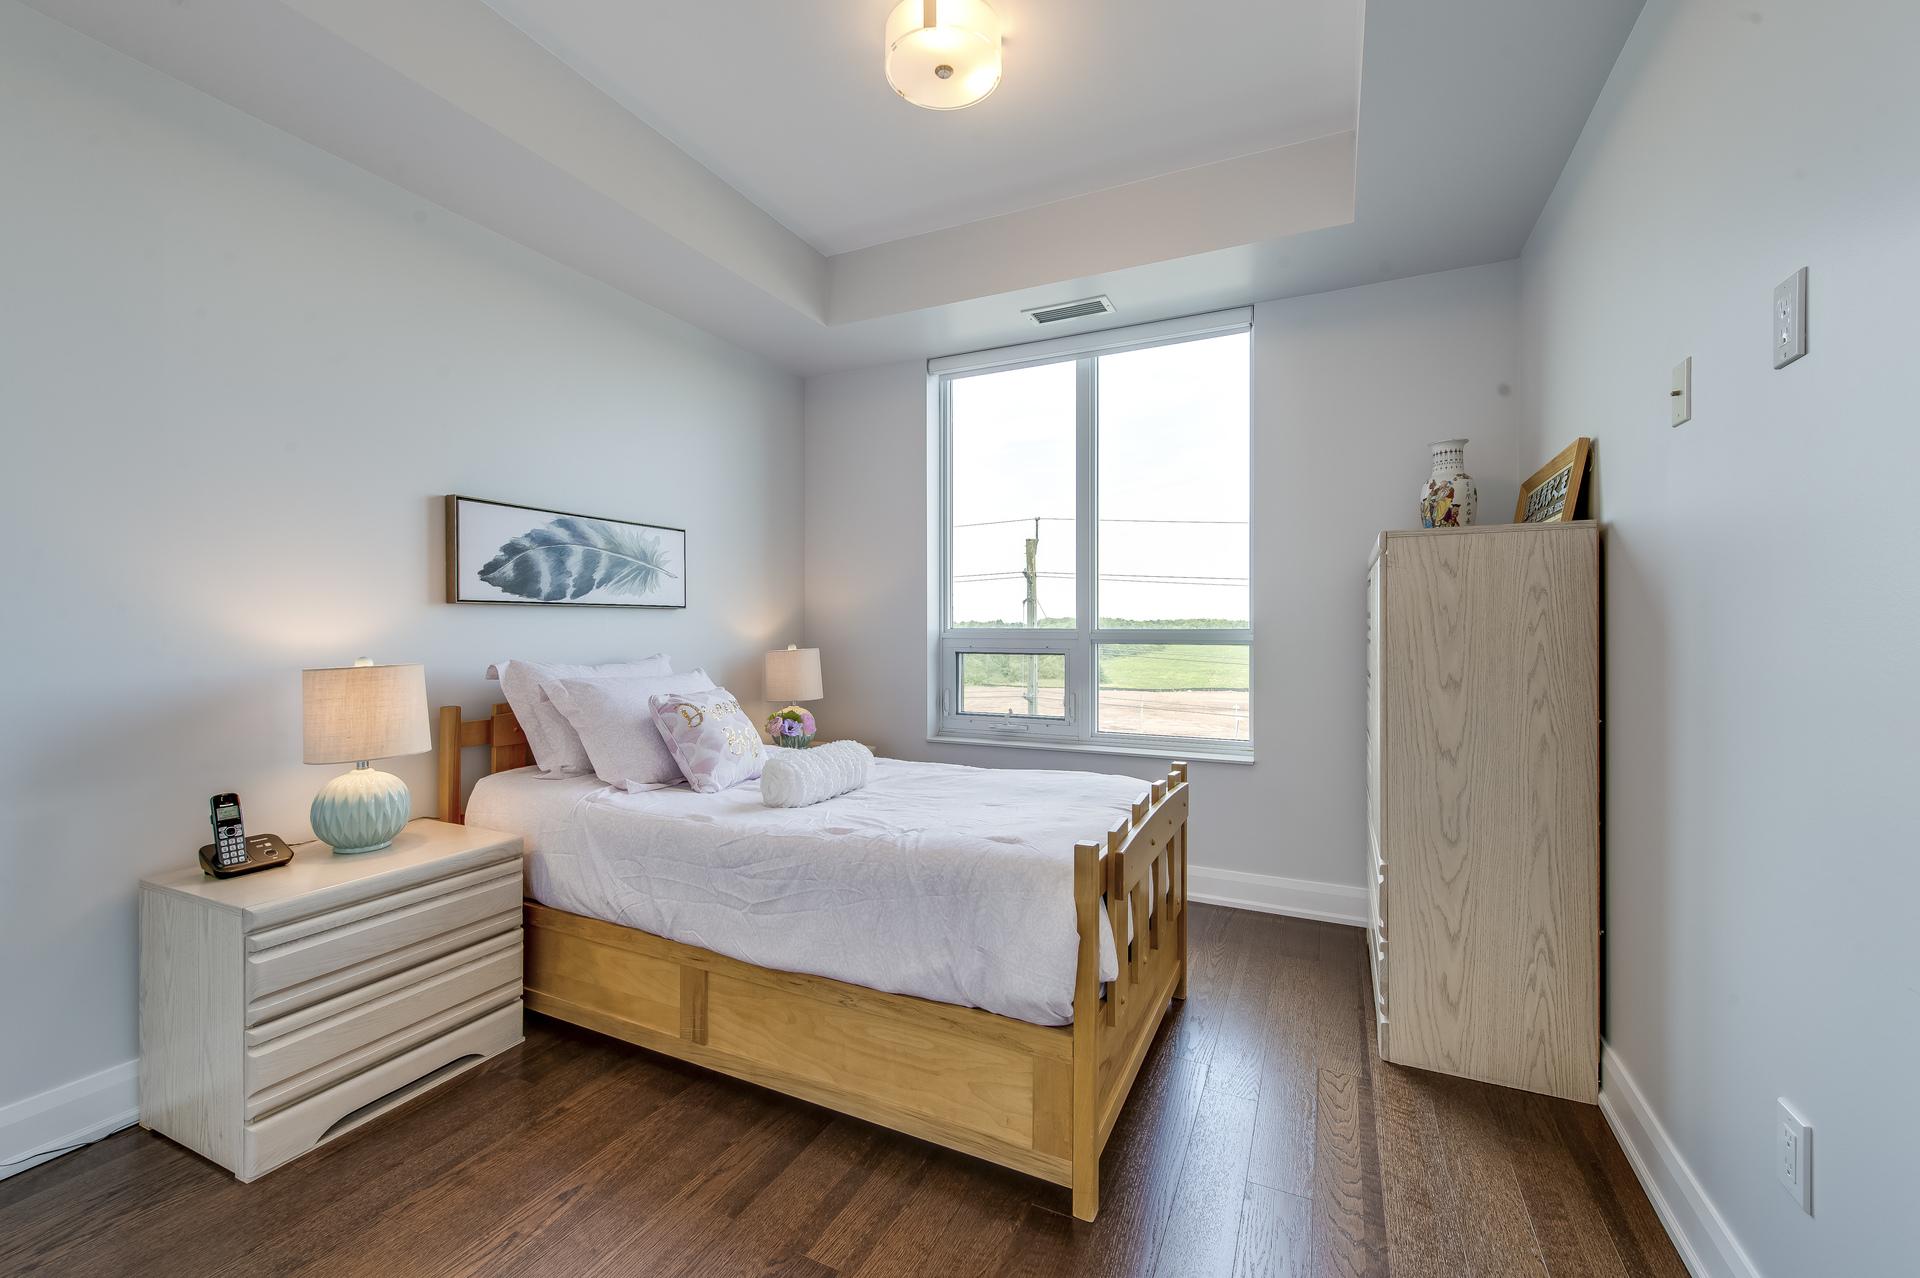 Master Bedroom - 514-2480 Price Michael Dr, Oakville - Elite3 & Team at 514 - 2480 Prince Michael Drive, Iroquois Ridge North, Oakville